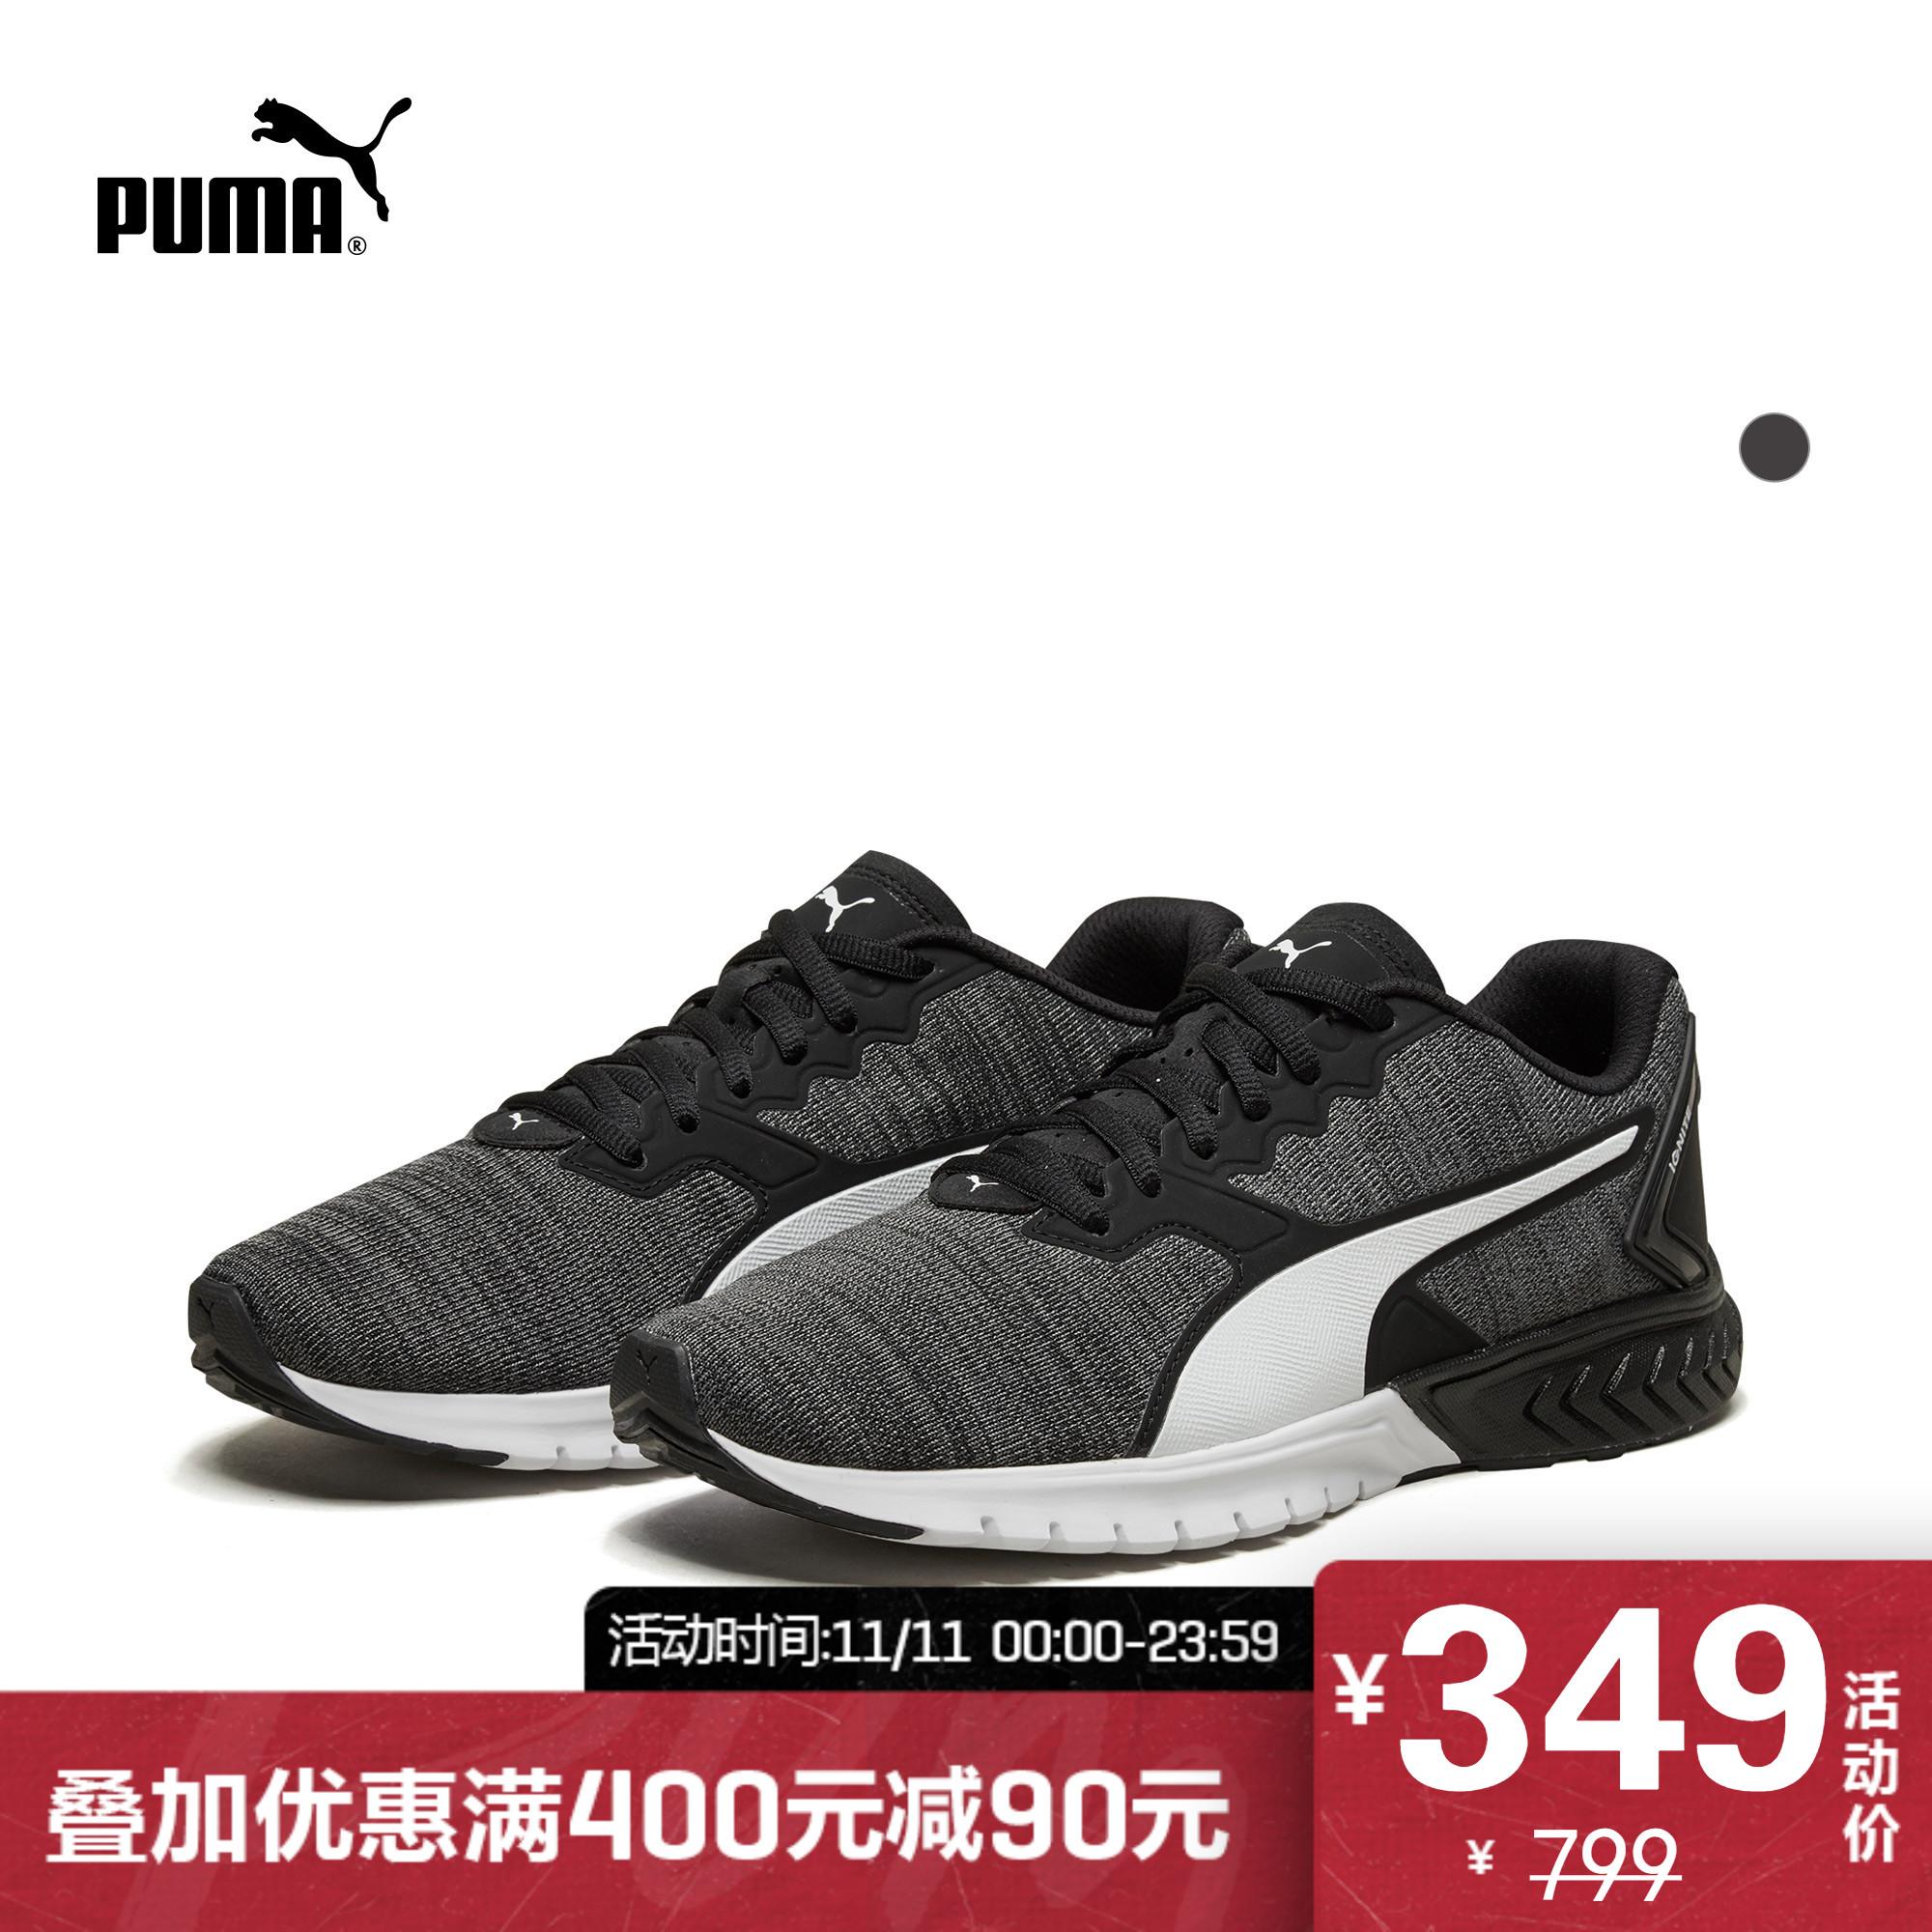 PUMA彪马官方 女子跑步鞋 IGNITE Dual NM 191482